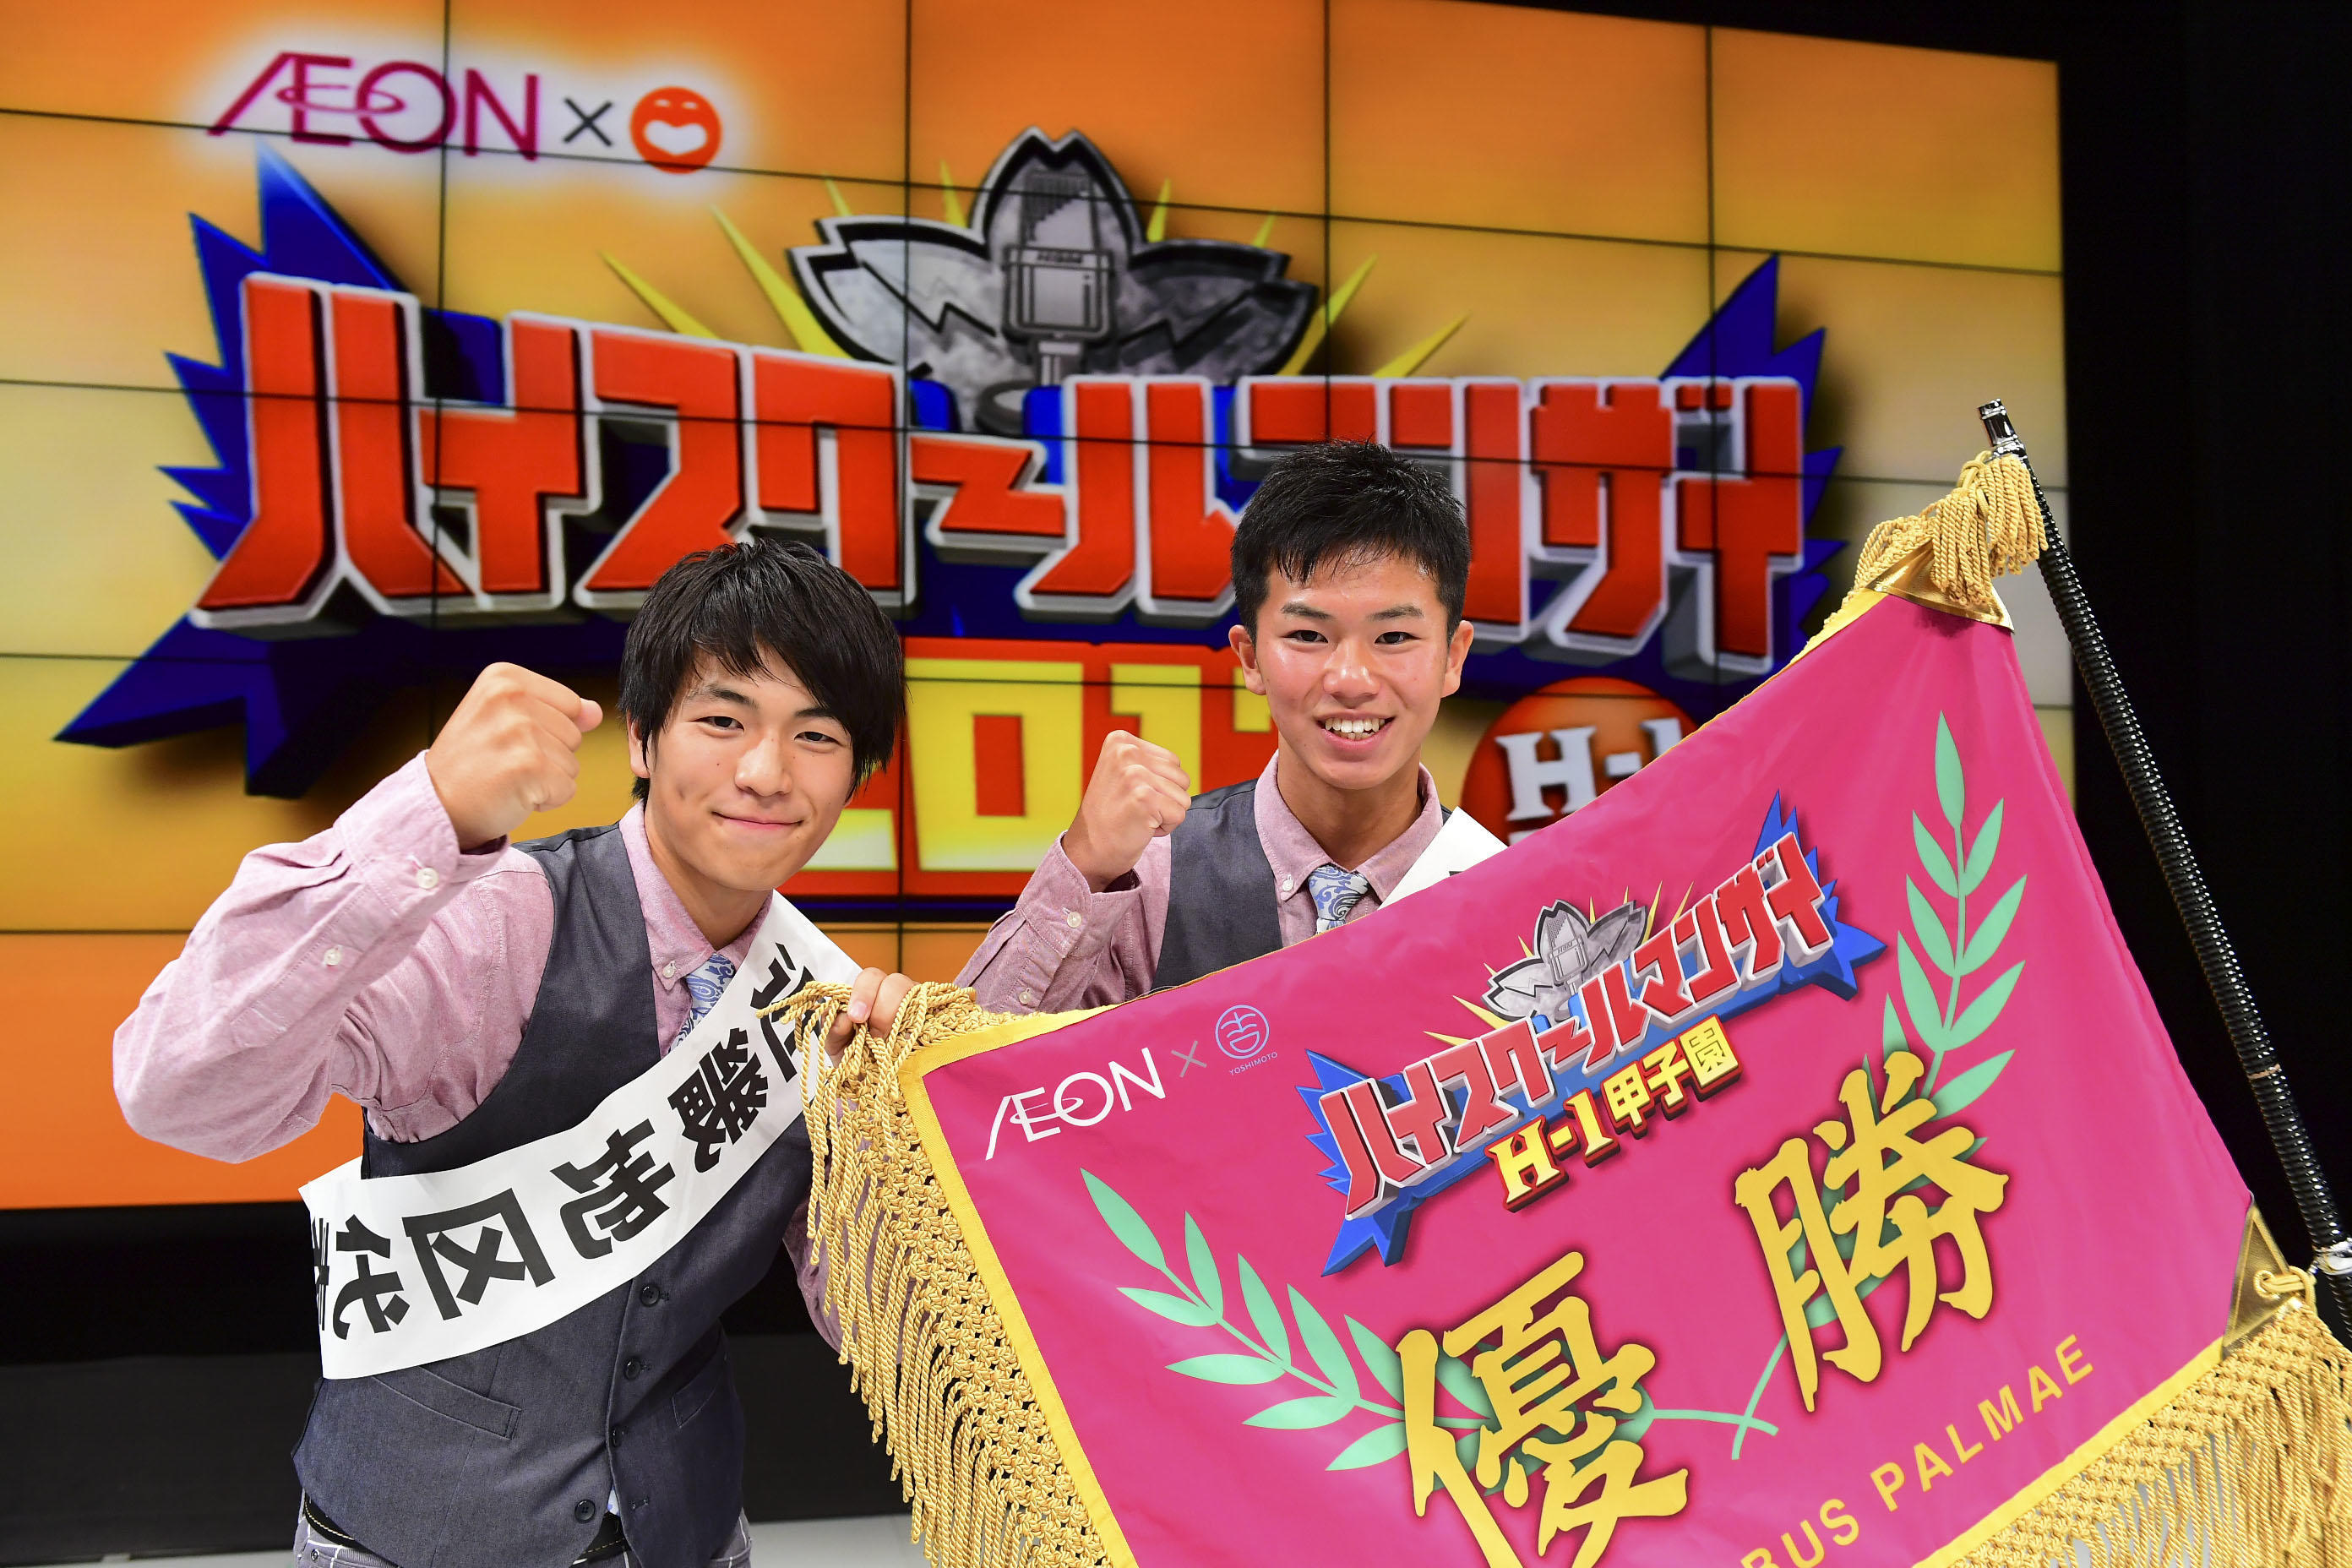 http://news.yoshimoto.co.jp/20170830150134-50e71d2813bc0362a06619cc7cd31a19a4033624.jpg